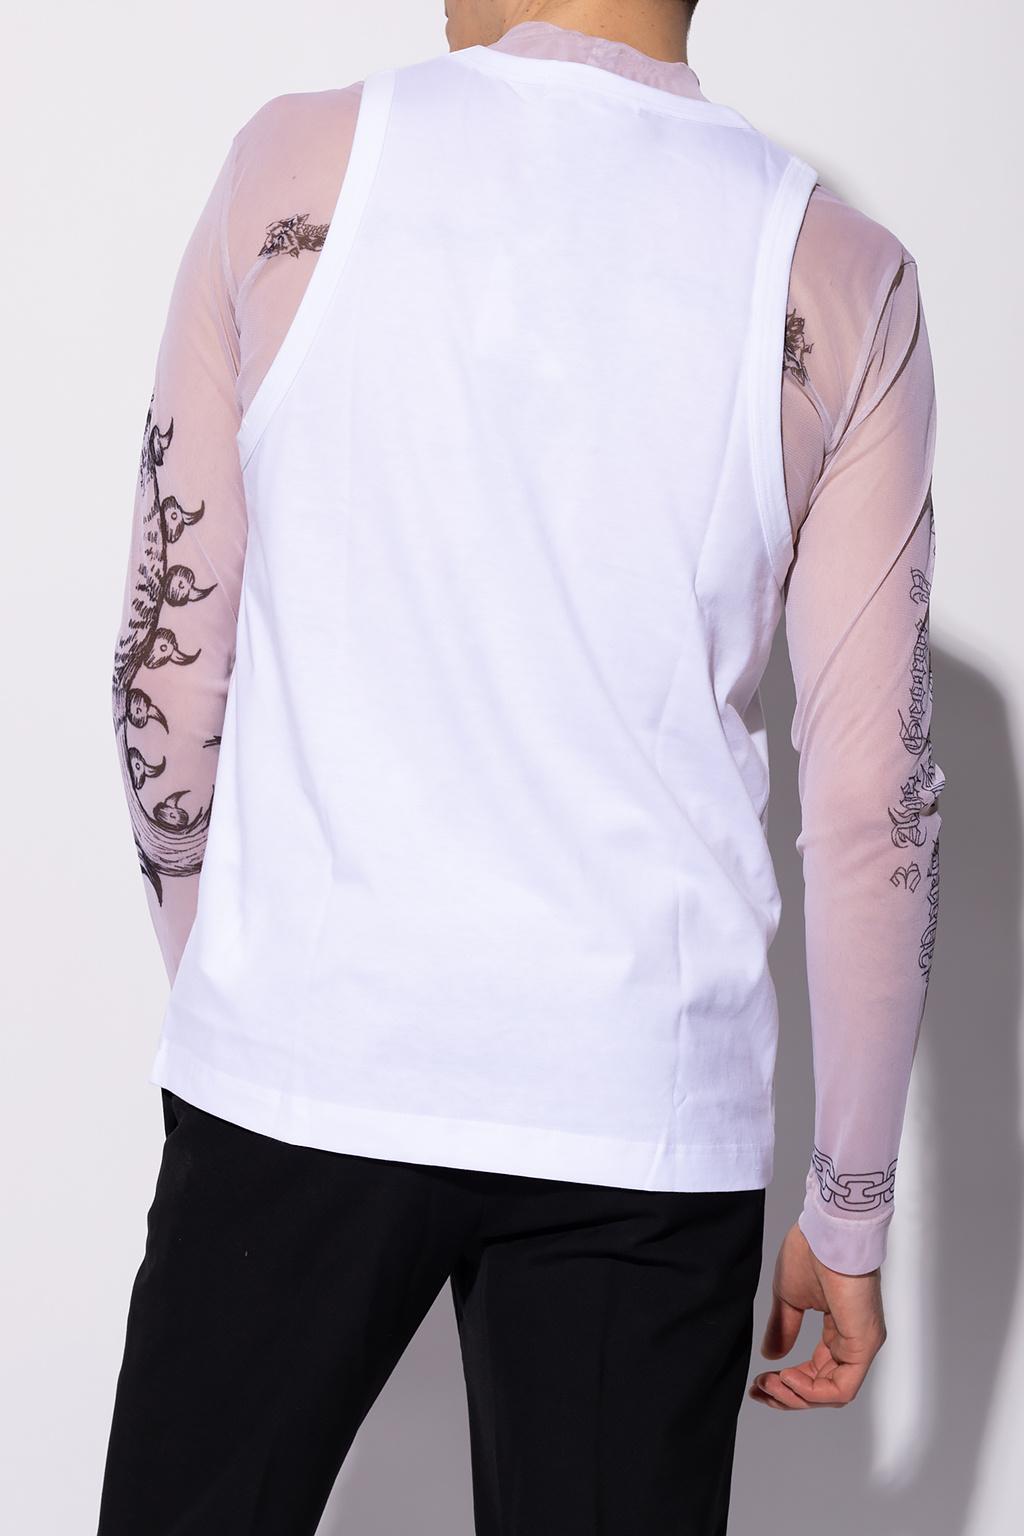 Comme des Garcons Shirt Printed T-shirt